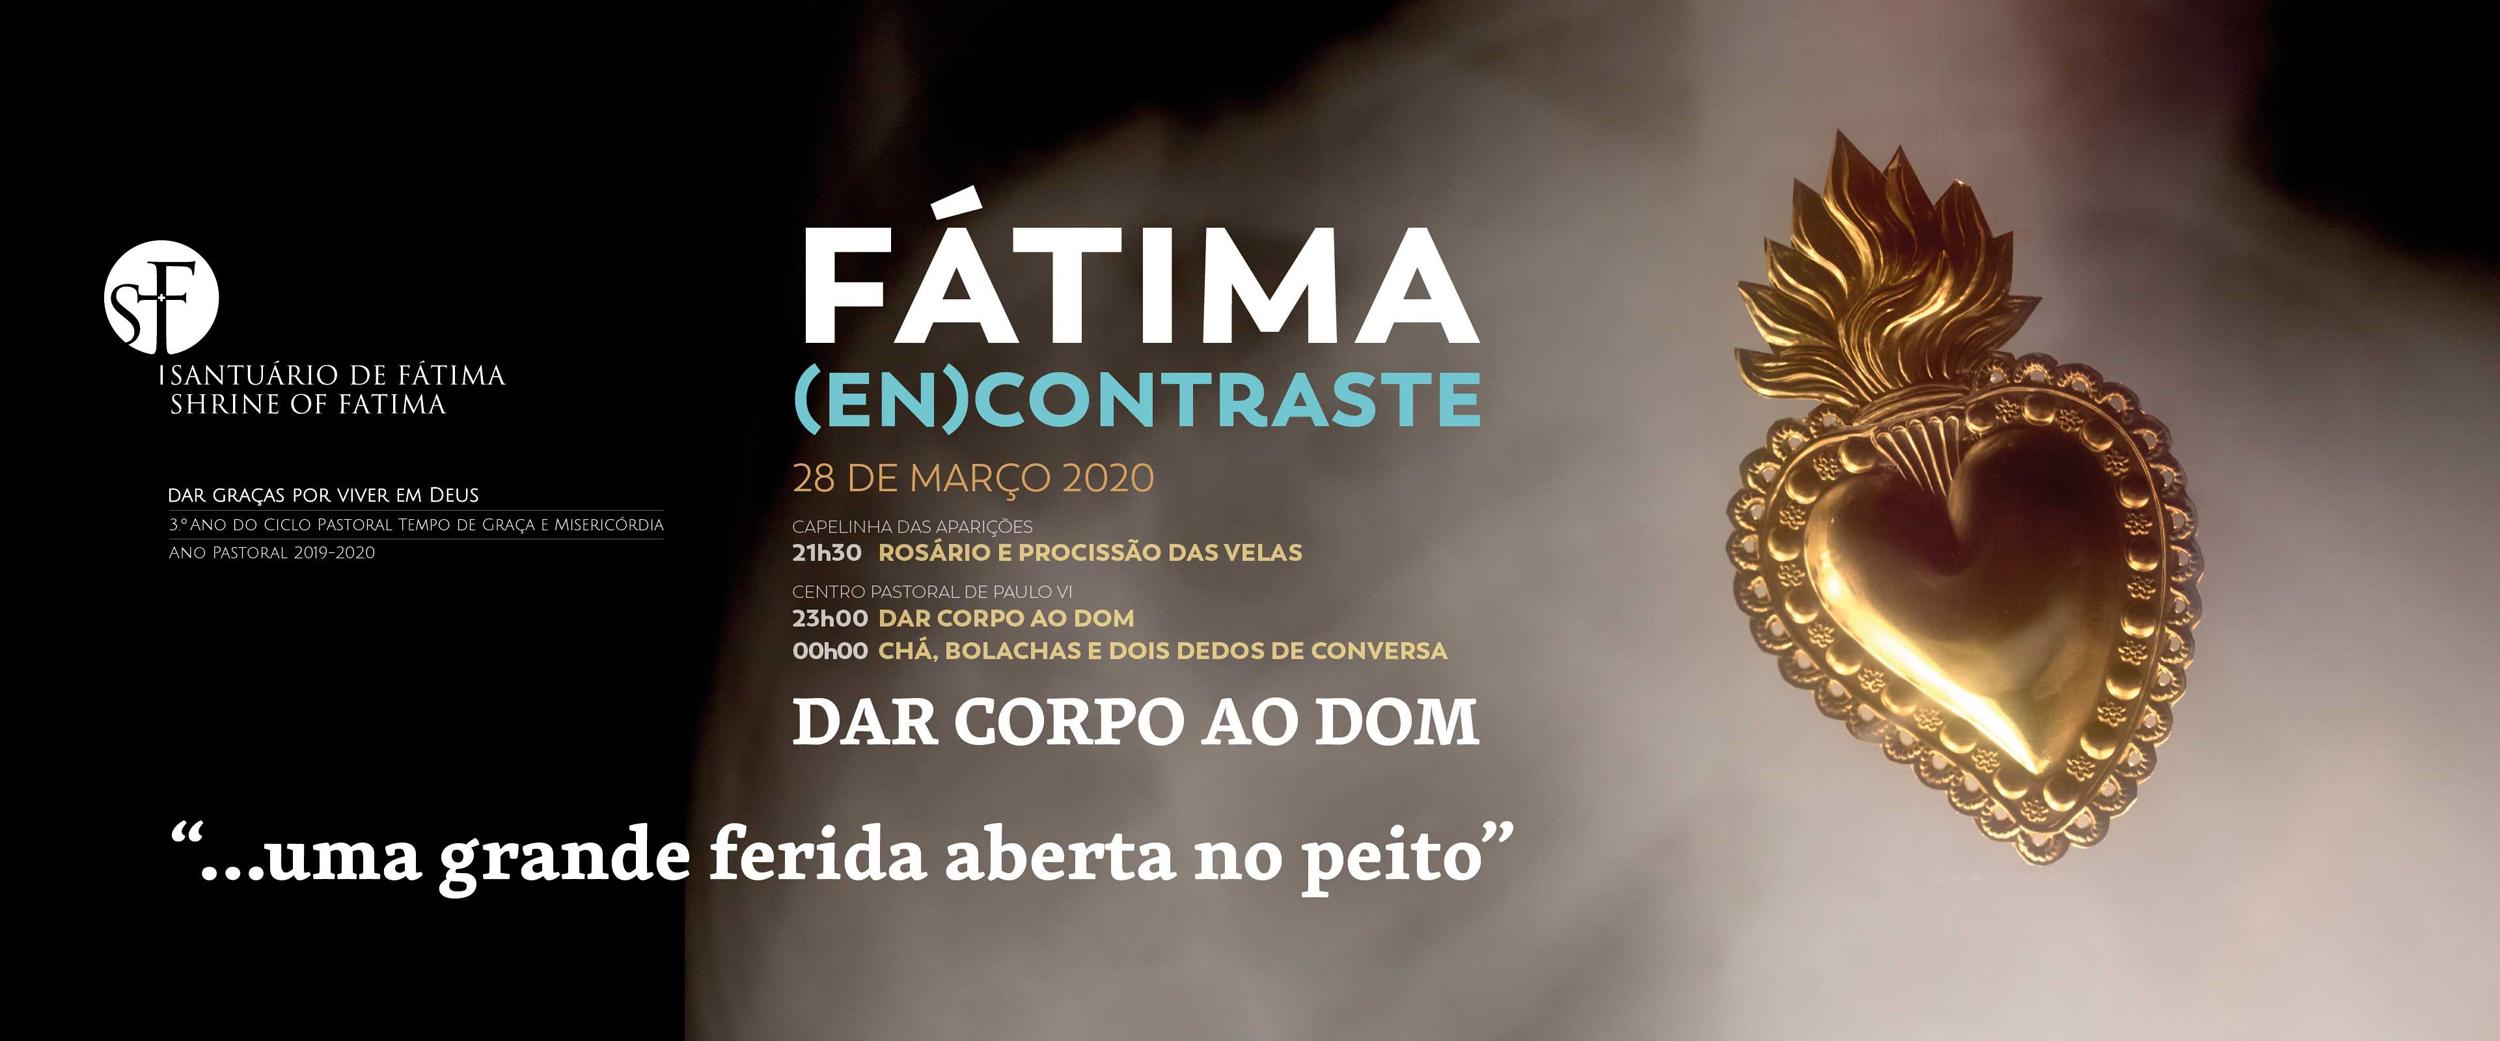 2020-03-06_Fatima_Encontraste_Banner_1_Web.jpg